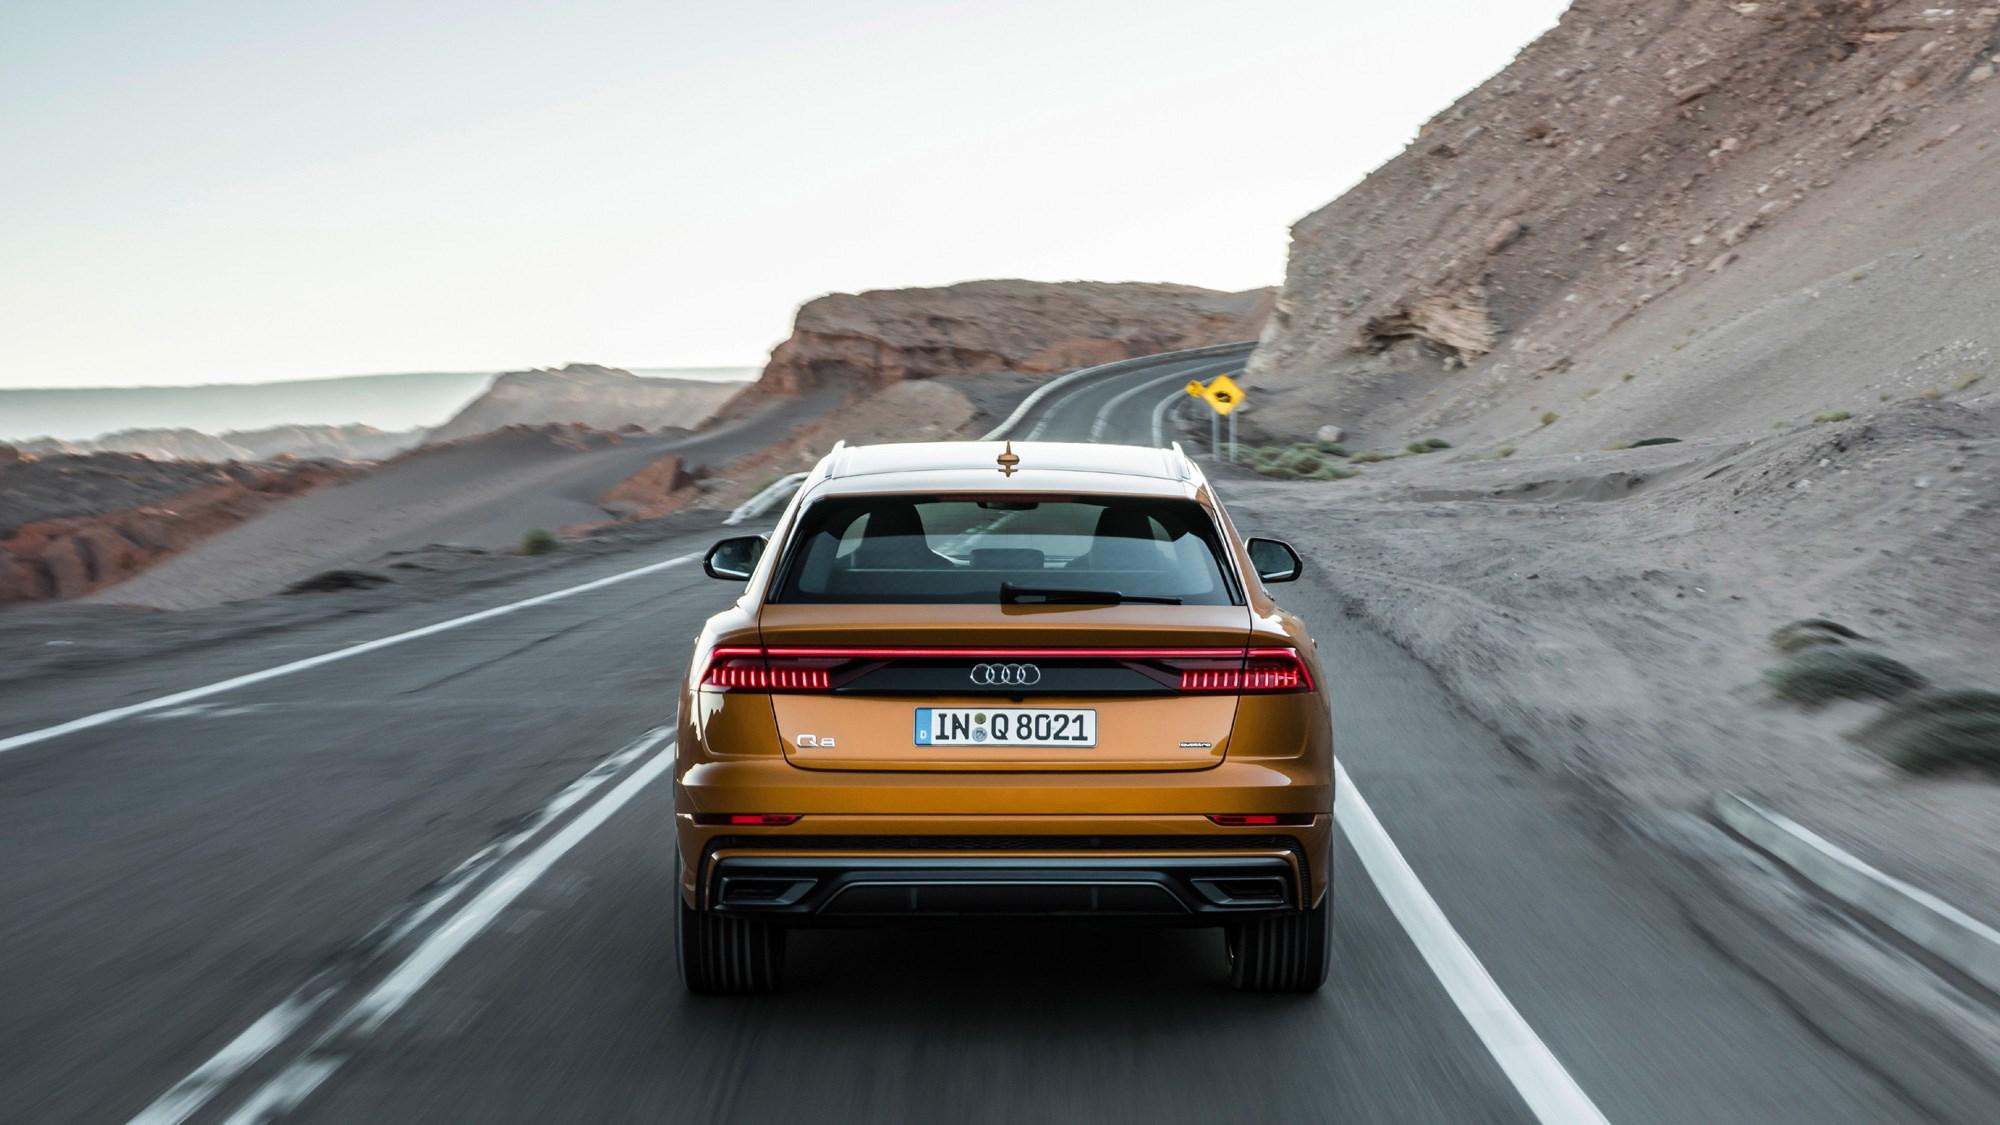 Audi Q8 review: a worthy flagship? | CAR Magazine